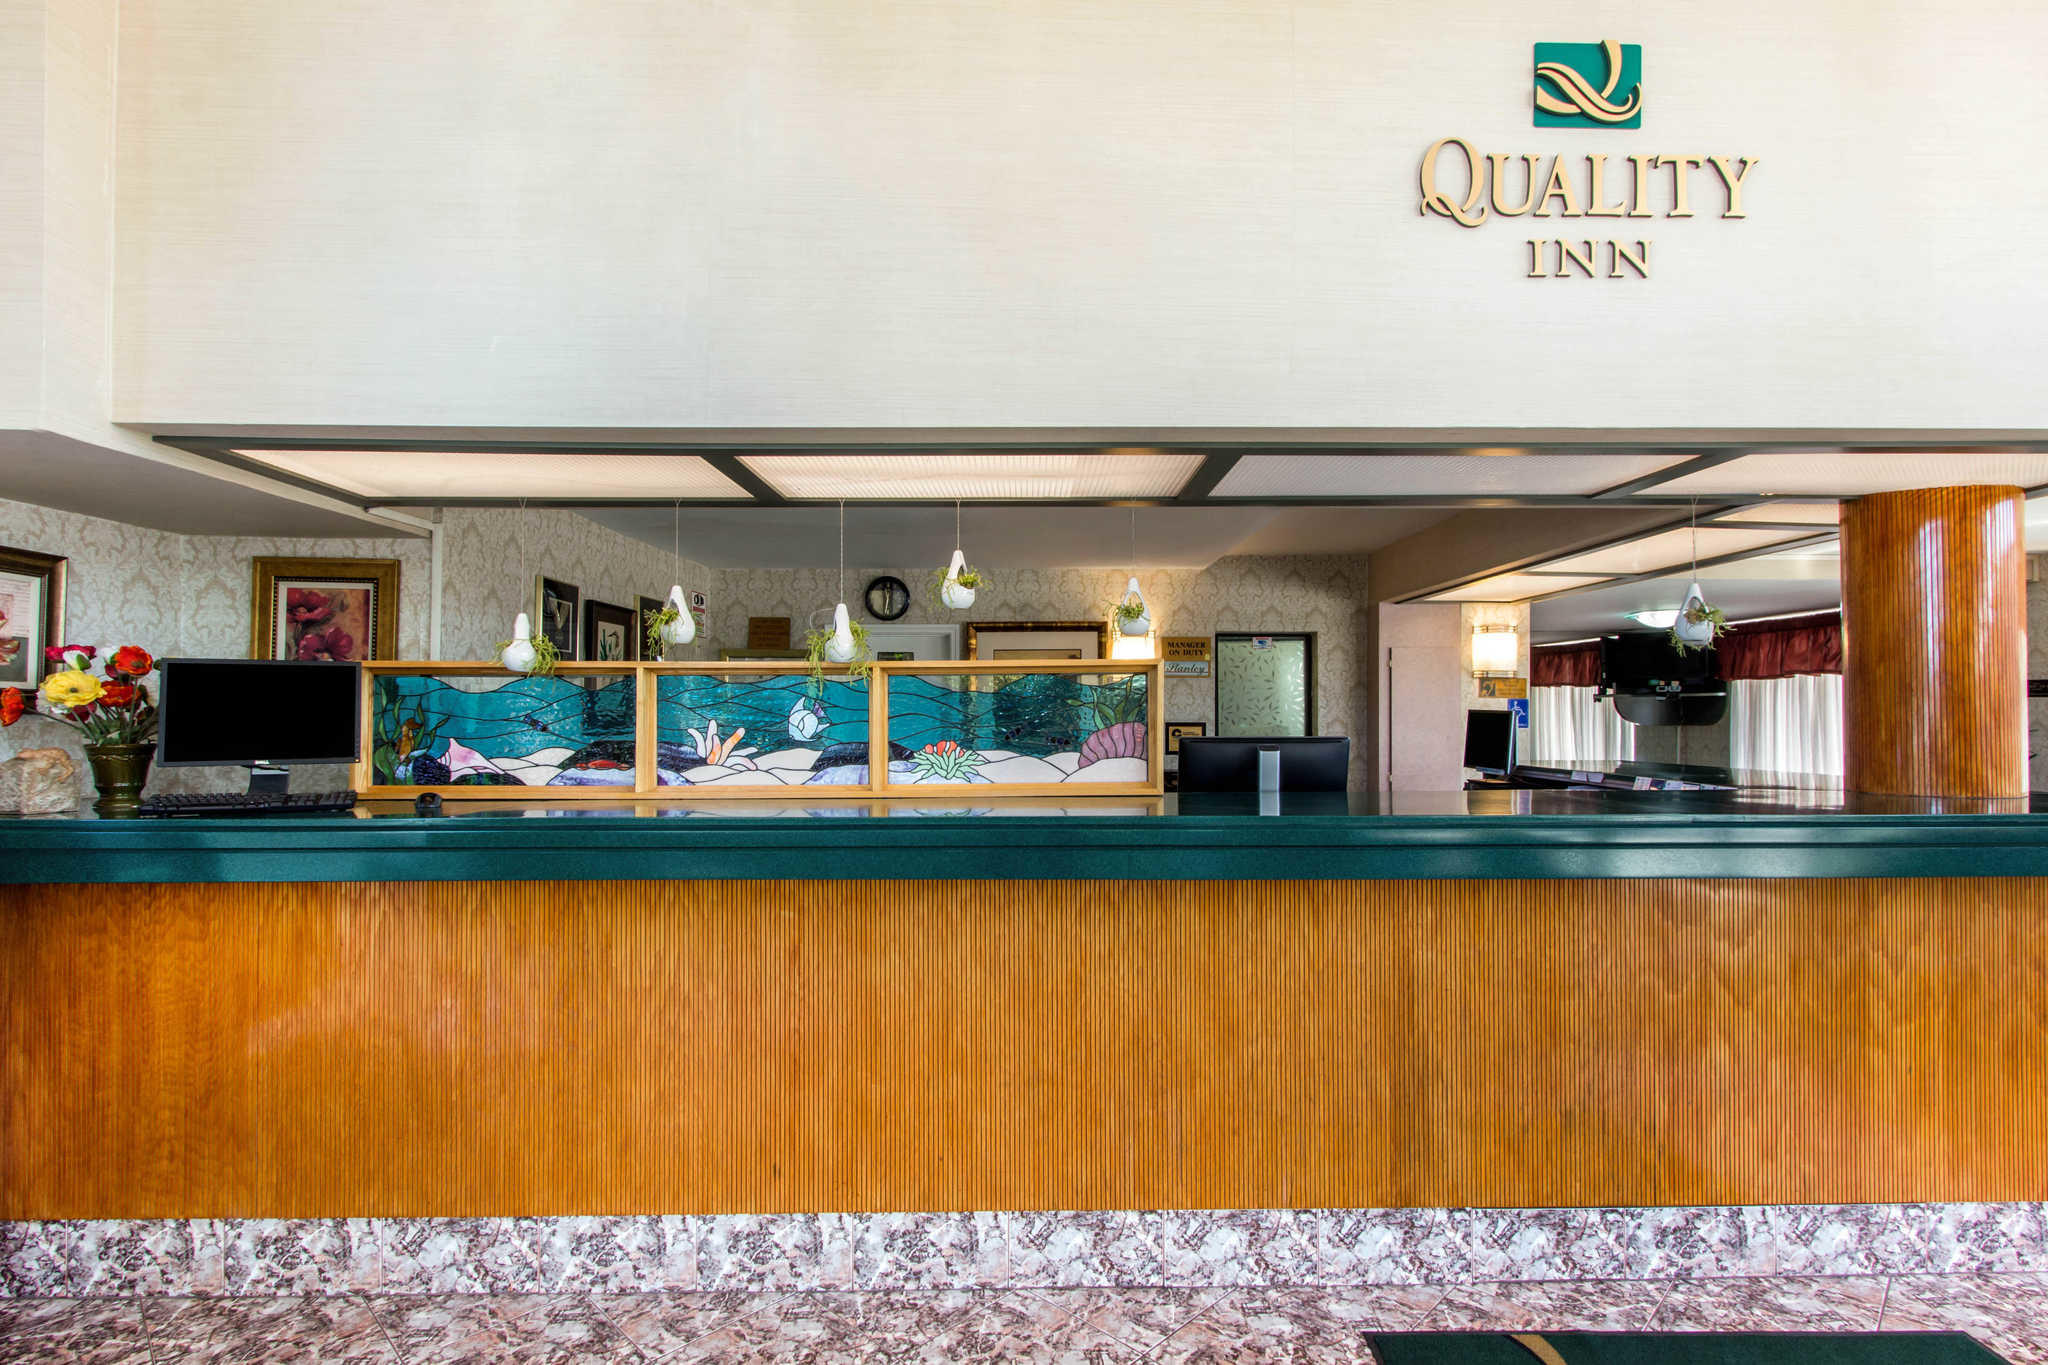 Quality Inn Central image 3